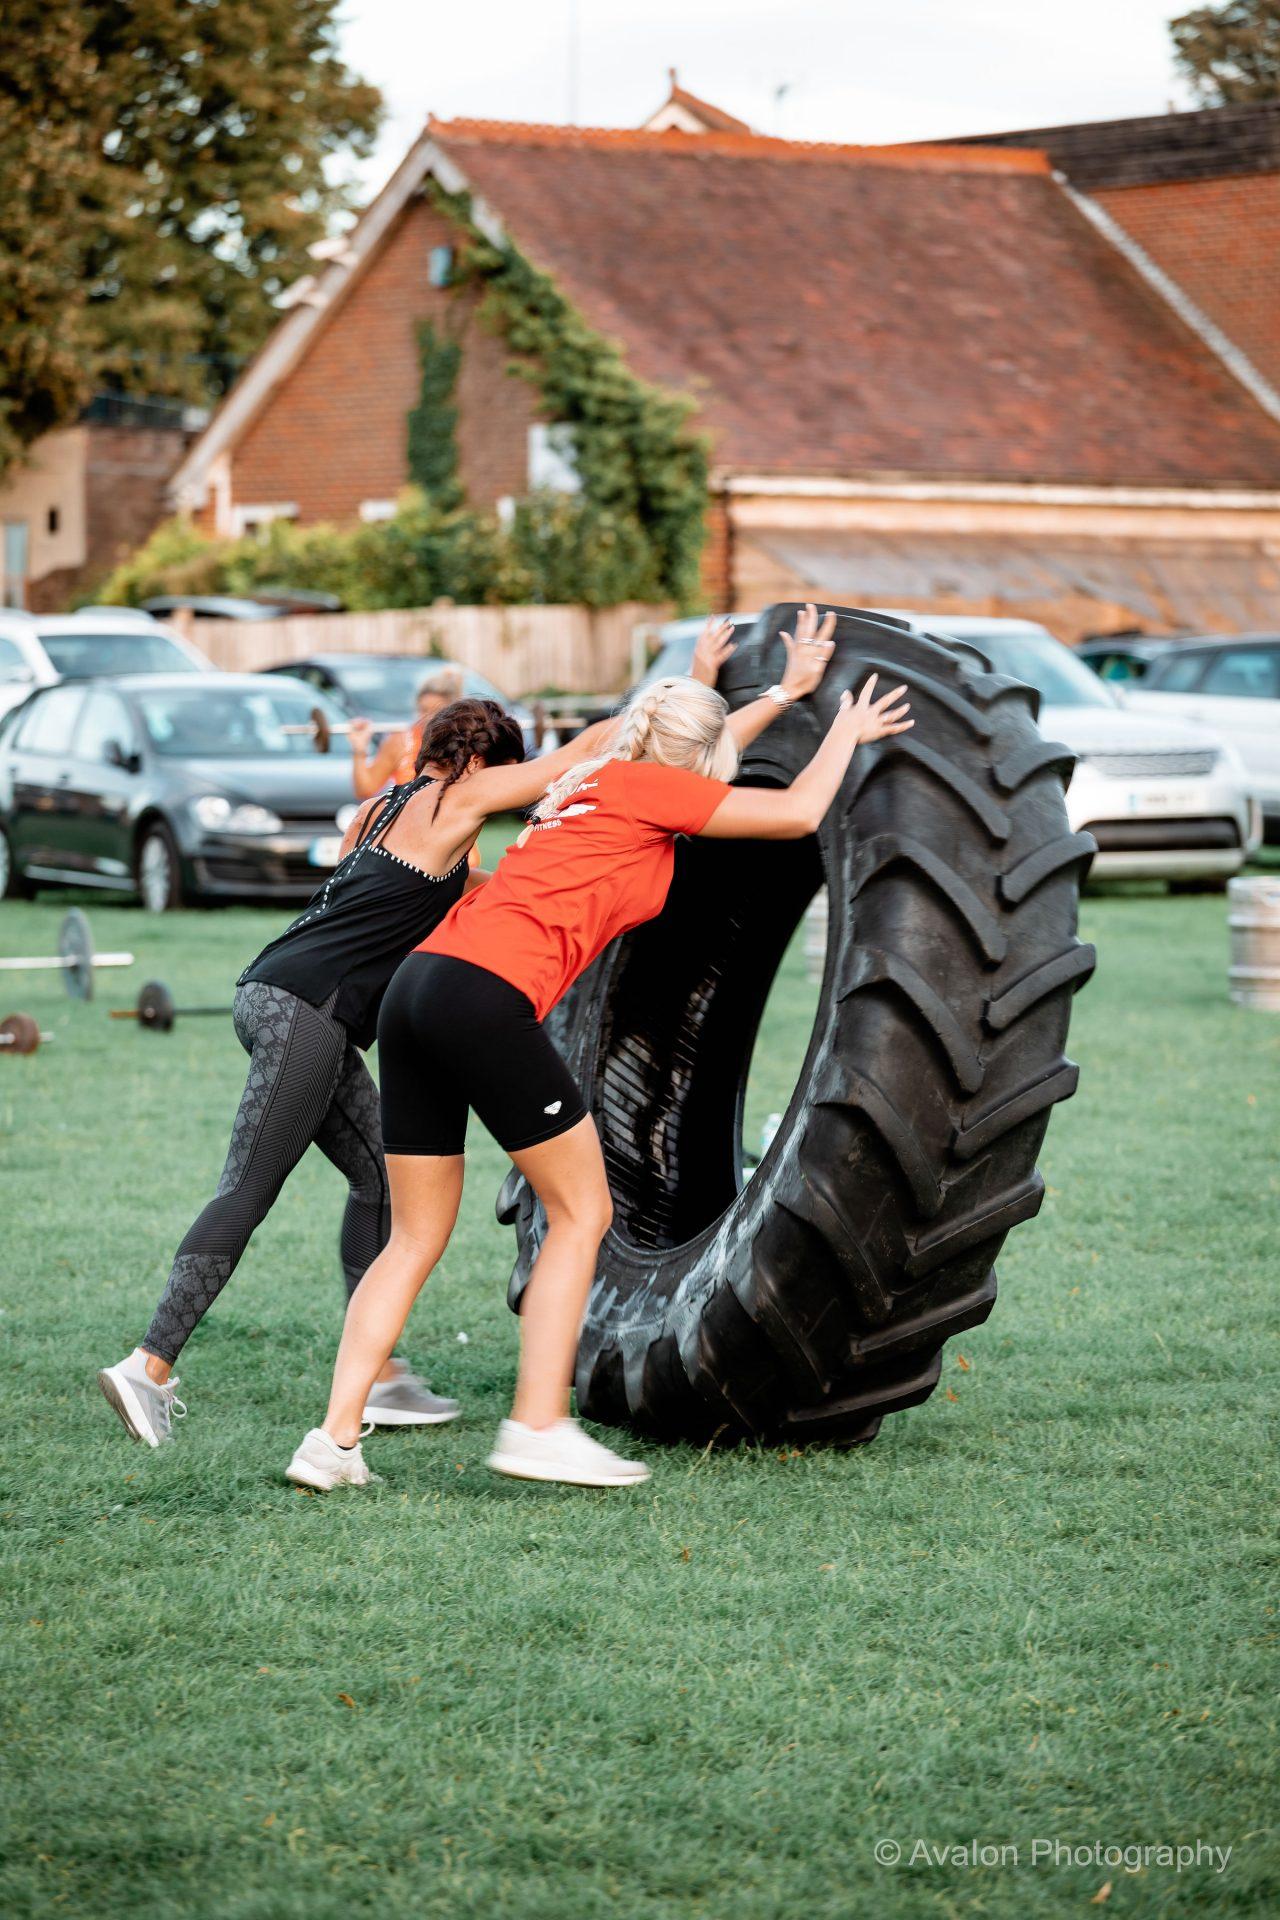 Pushing giant weight